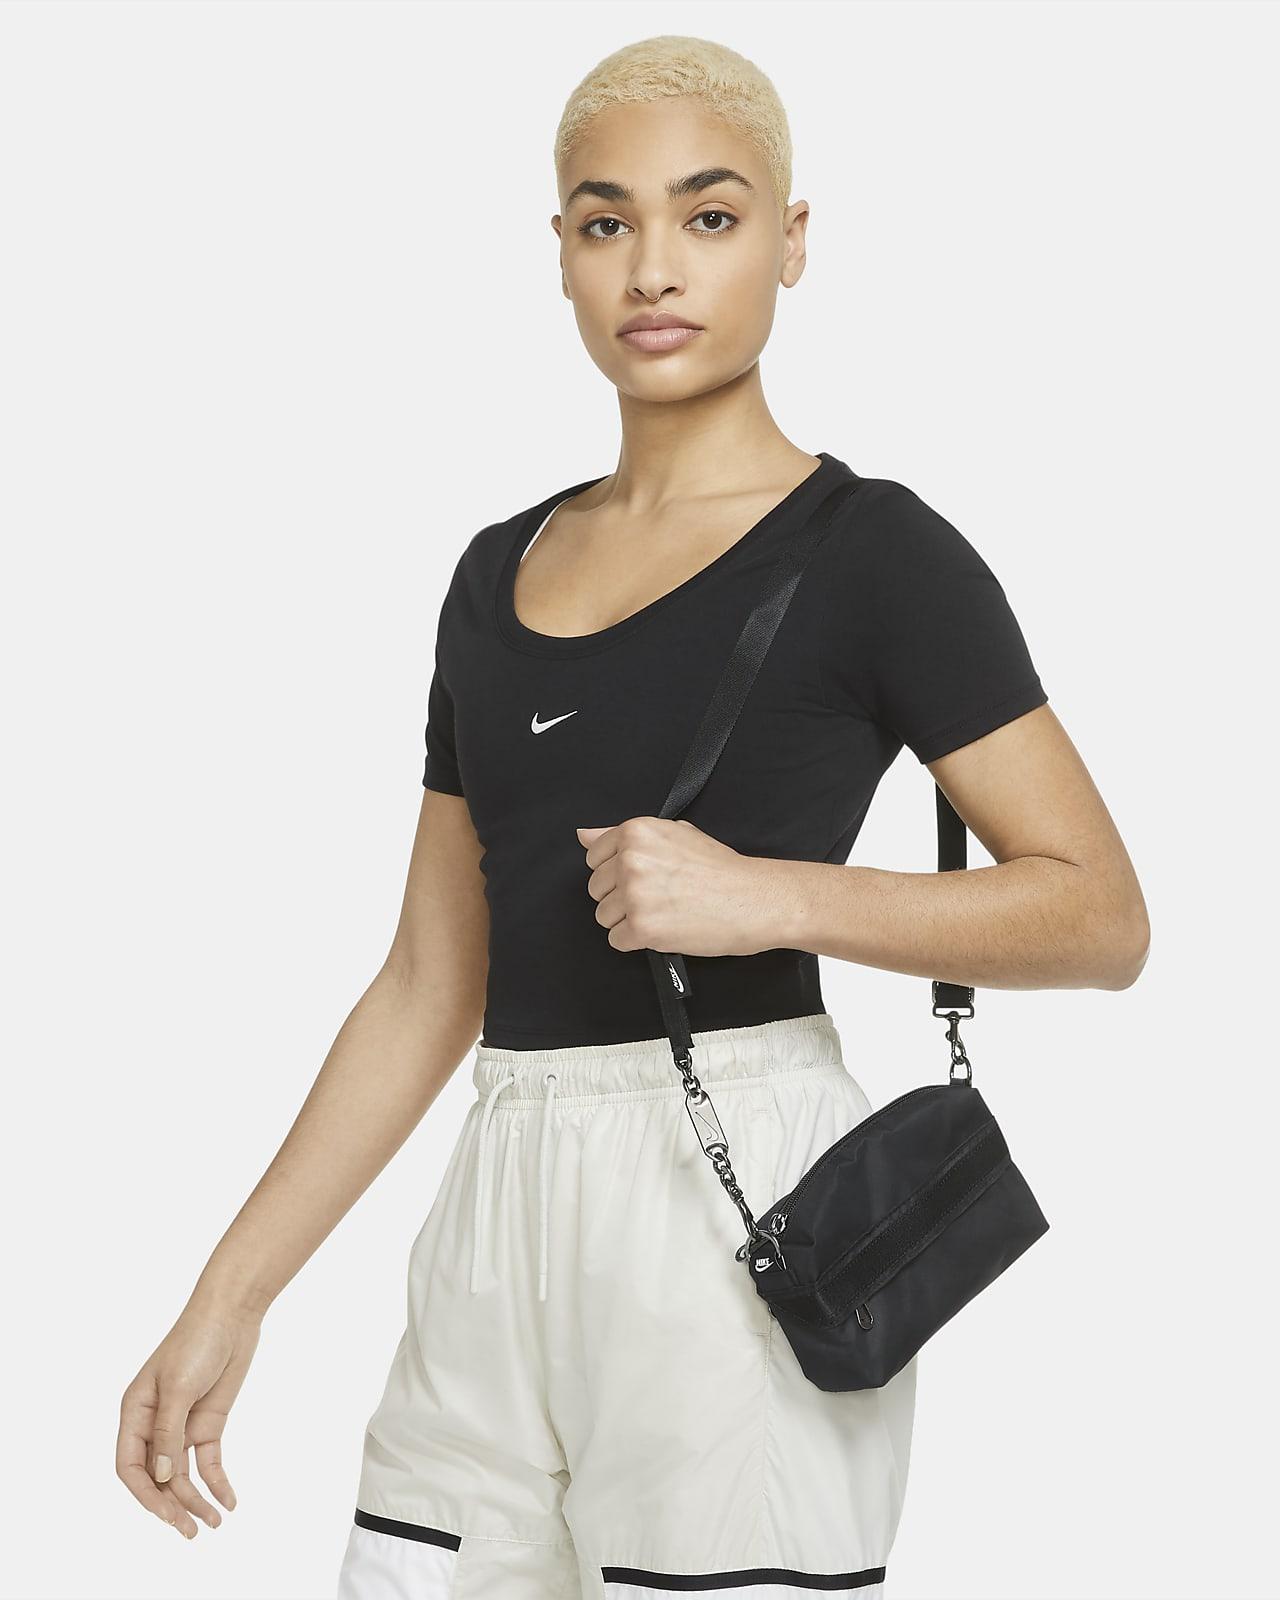 Bolsa bandolera para mujer Nike Sportswear Futura Luxe